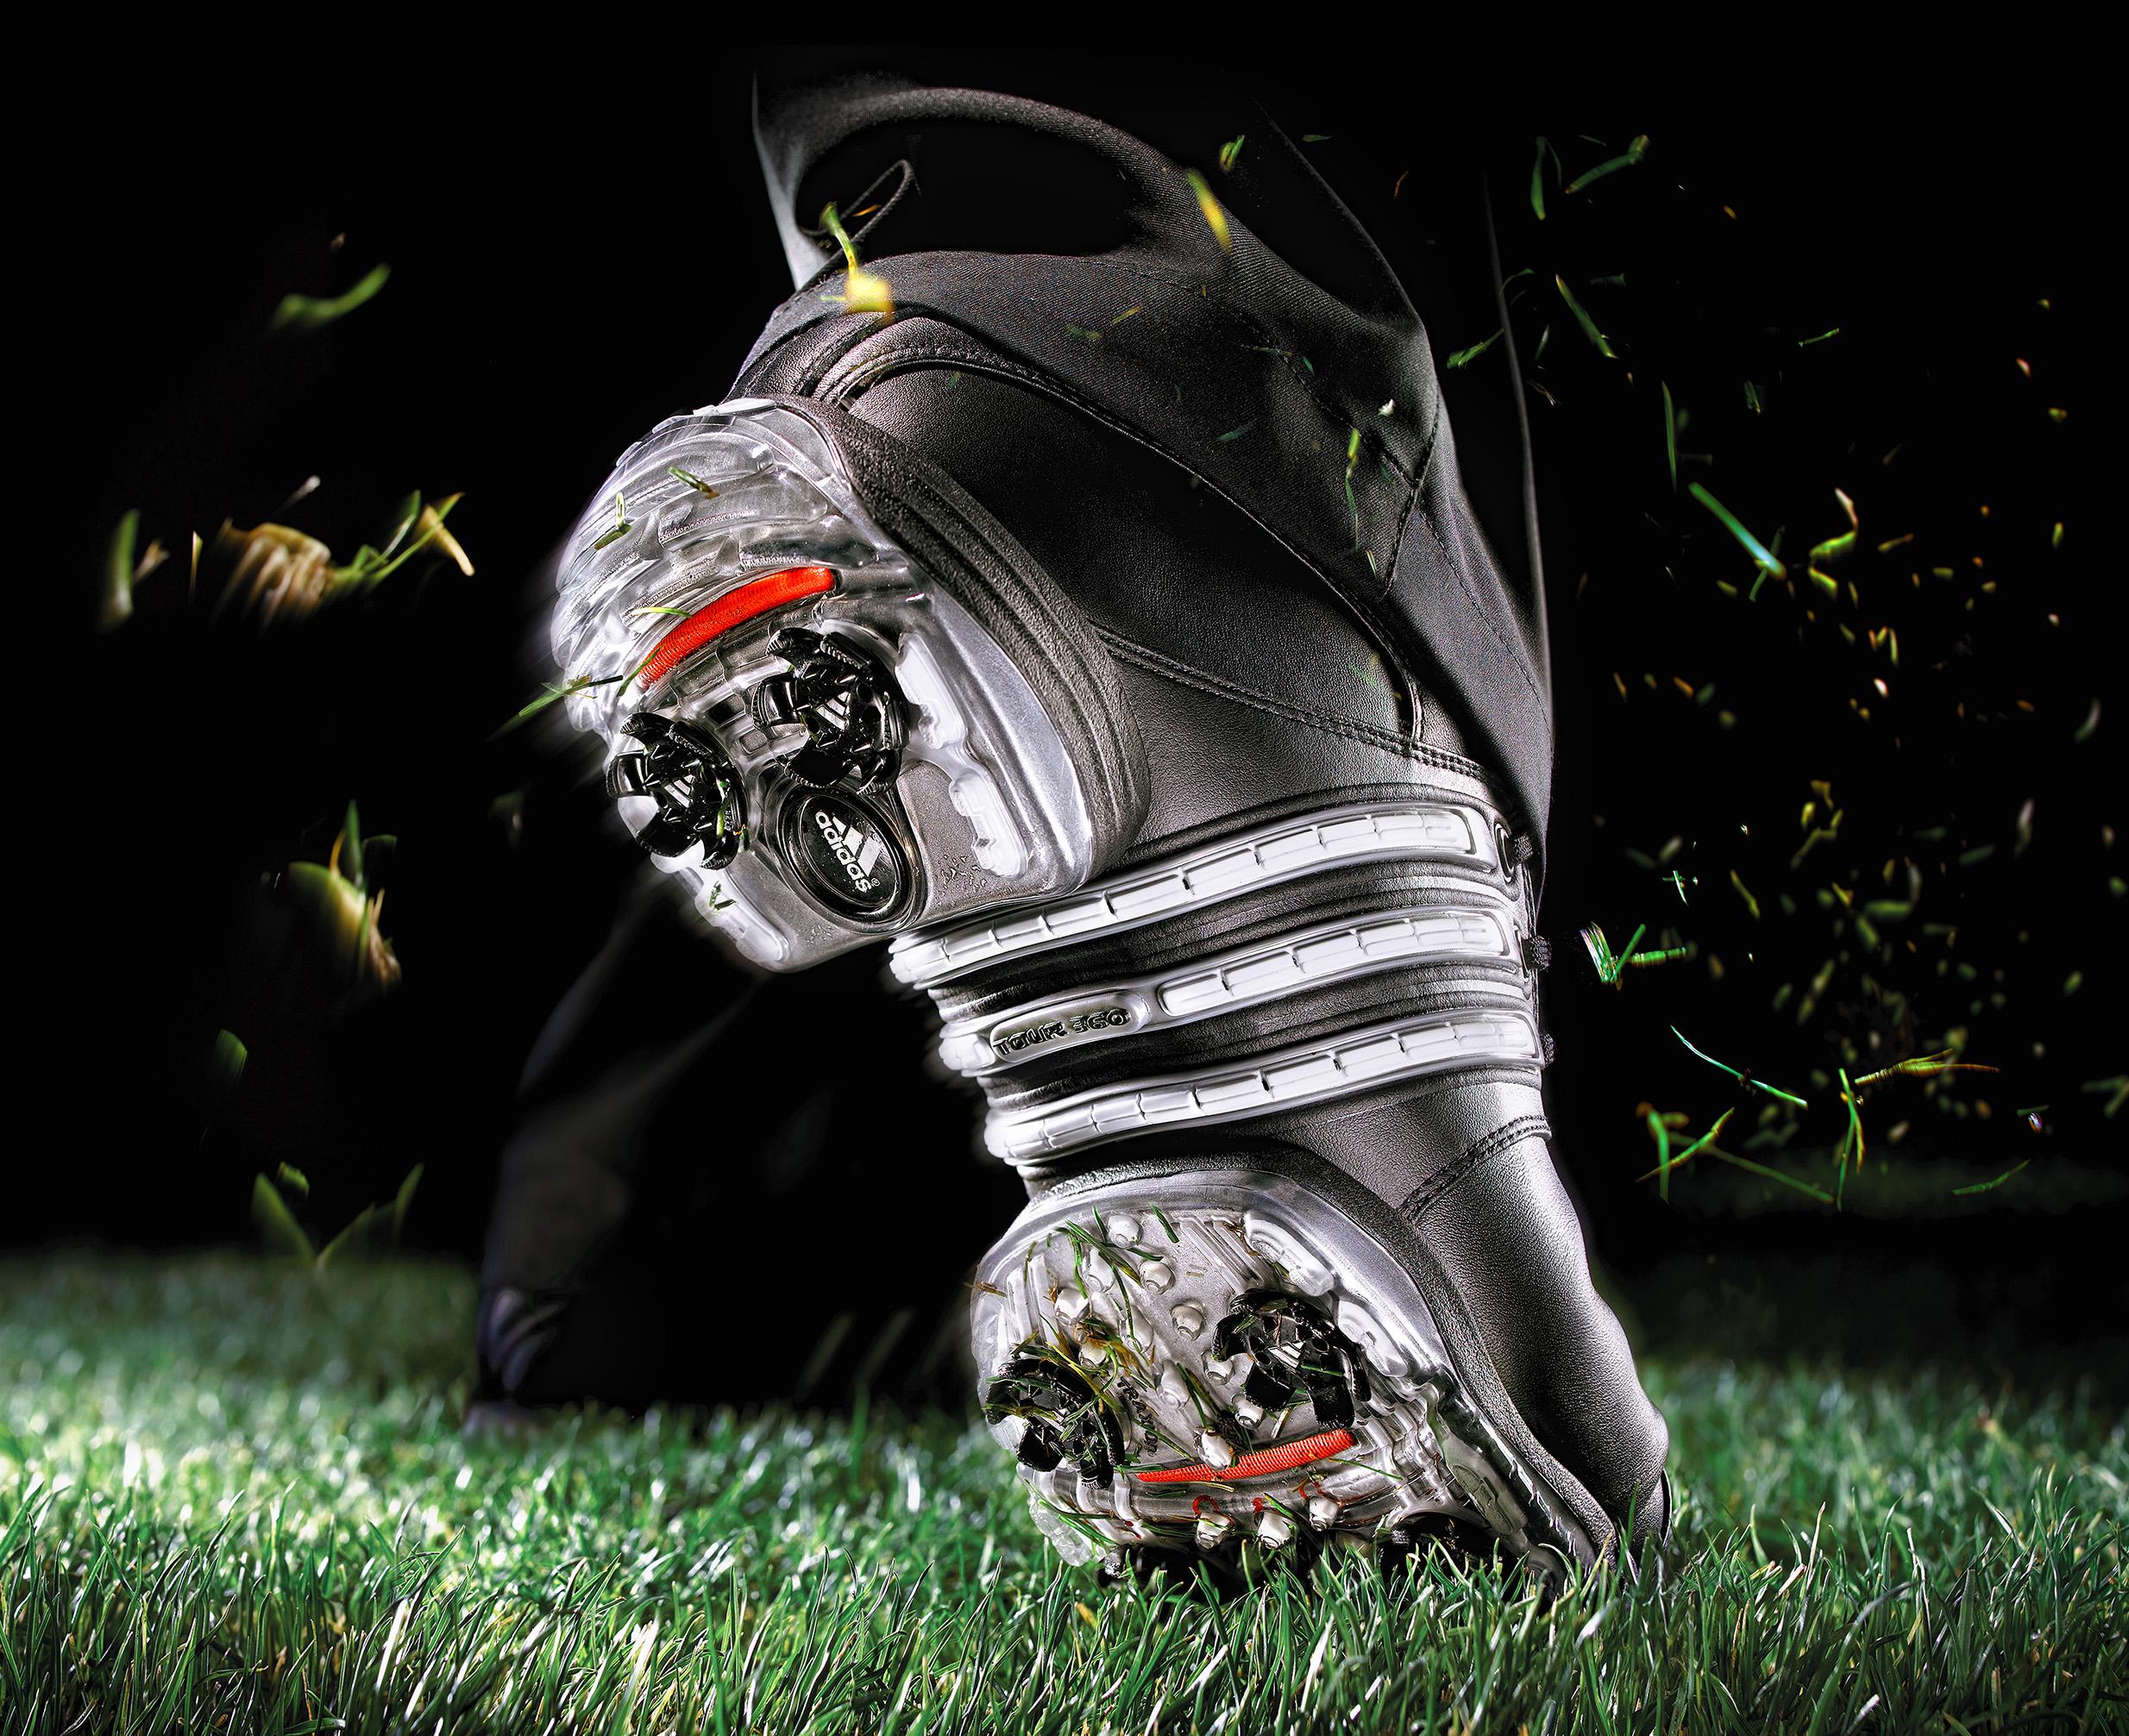 Adidas; TBWA Chiat Day San Francisco